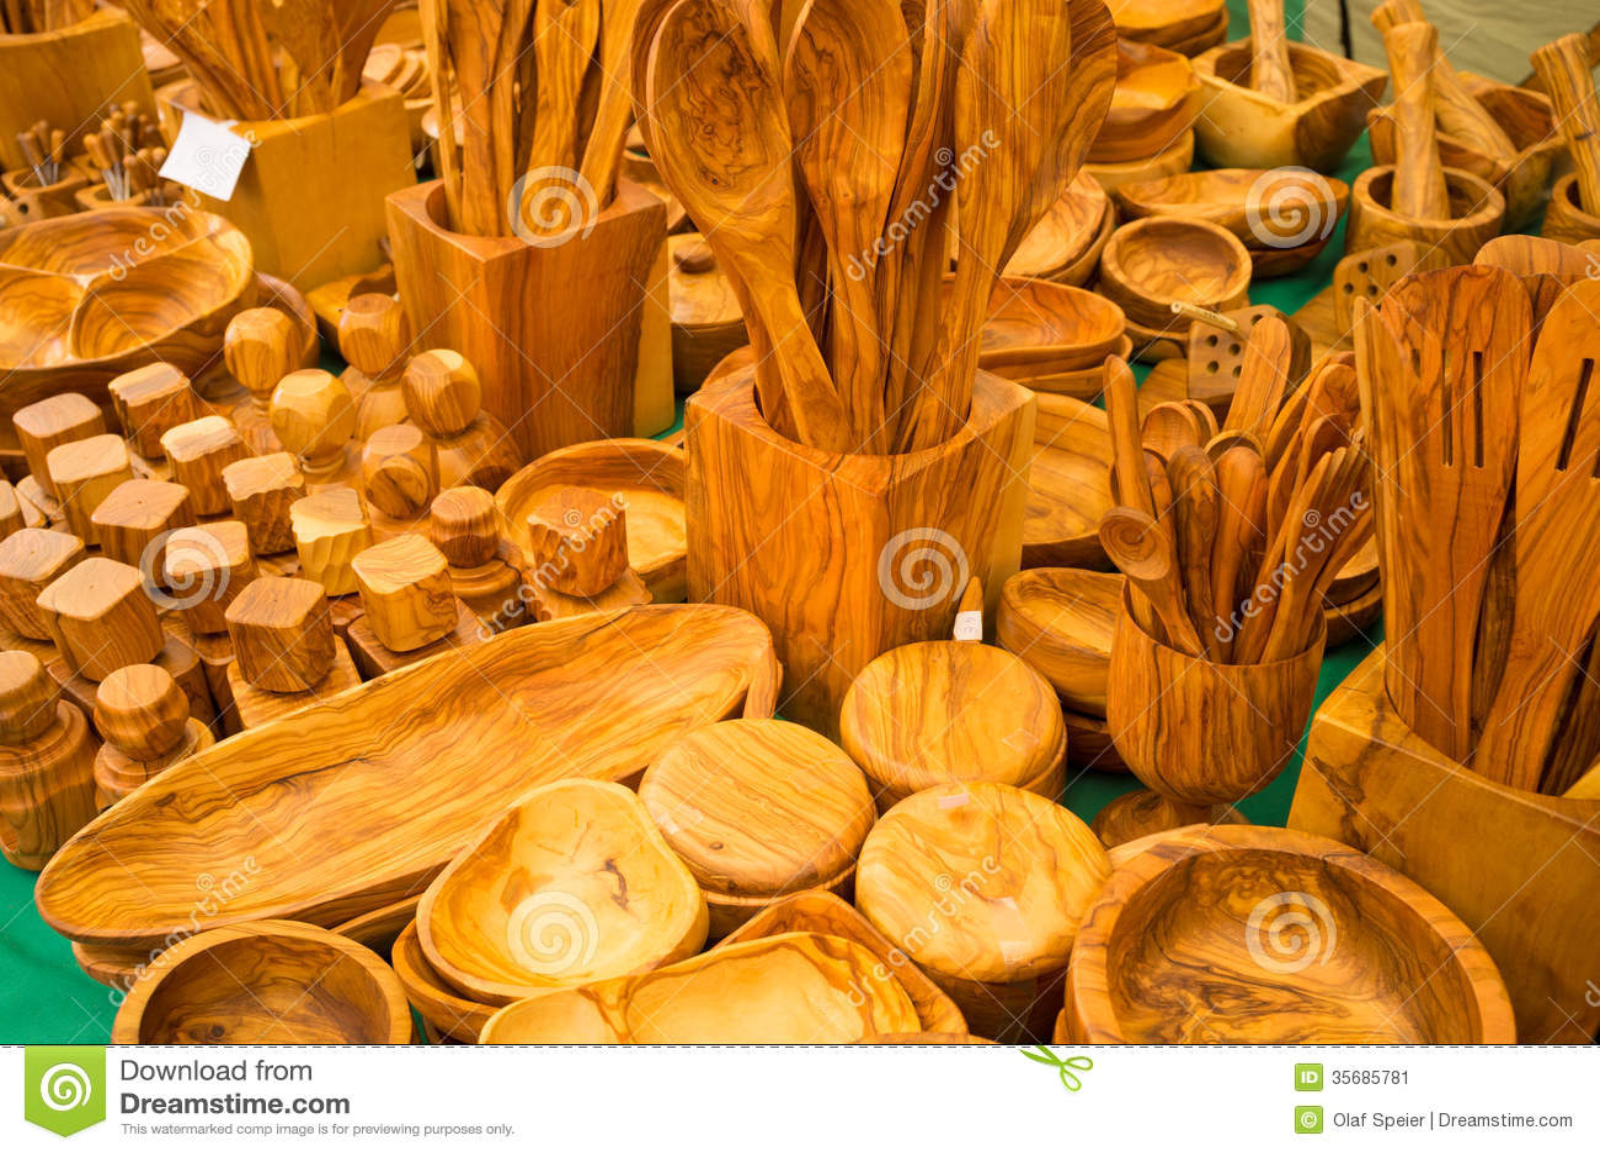 handcrafted kitchen utensils stock image image of handmade